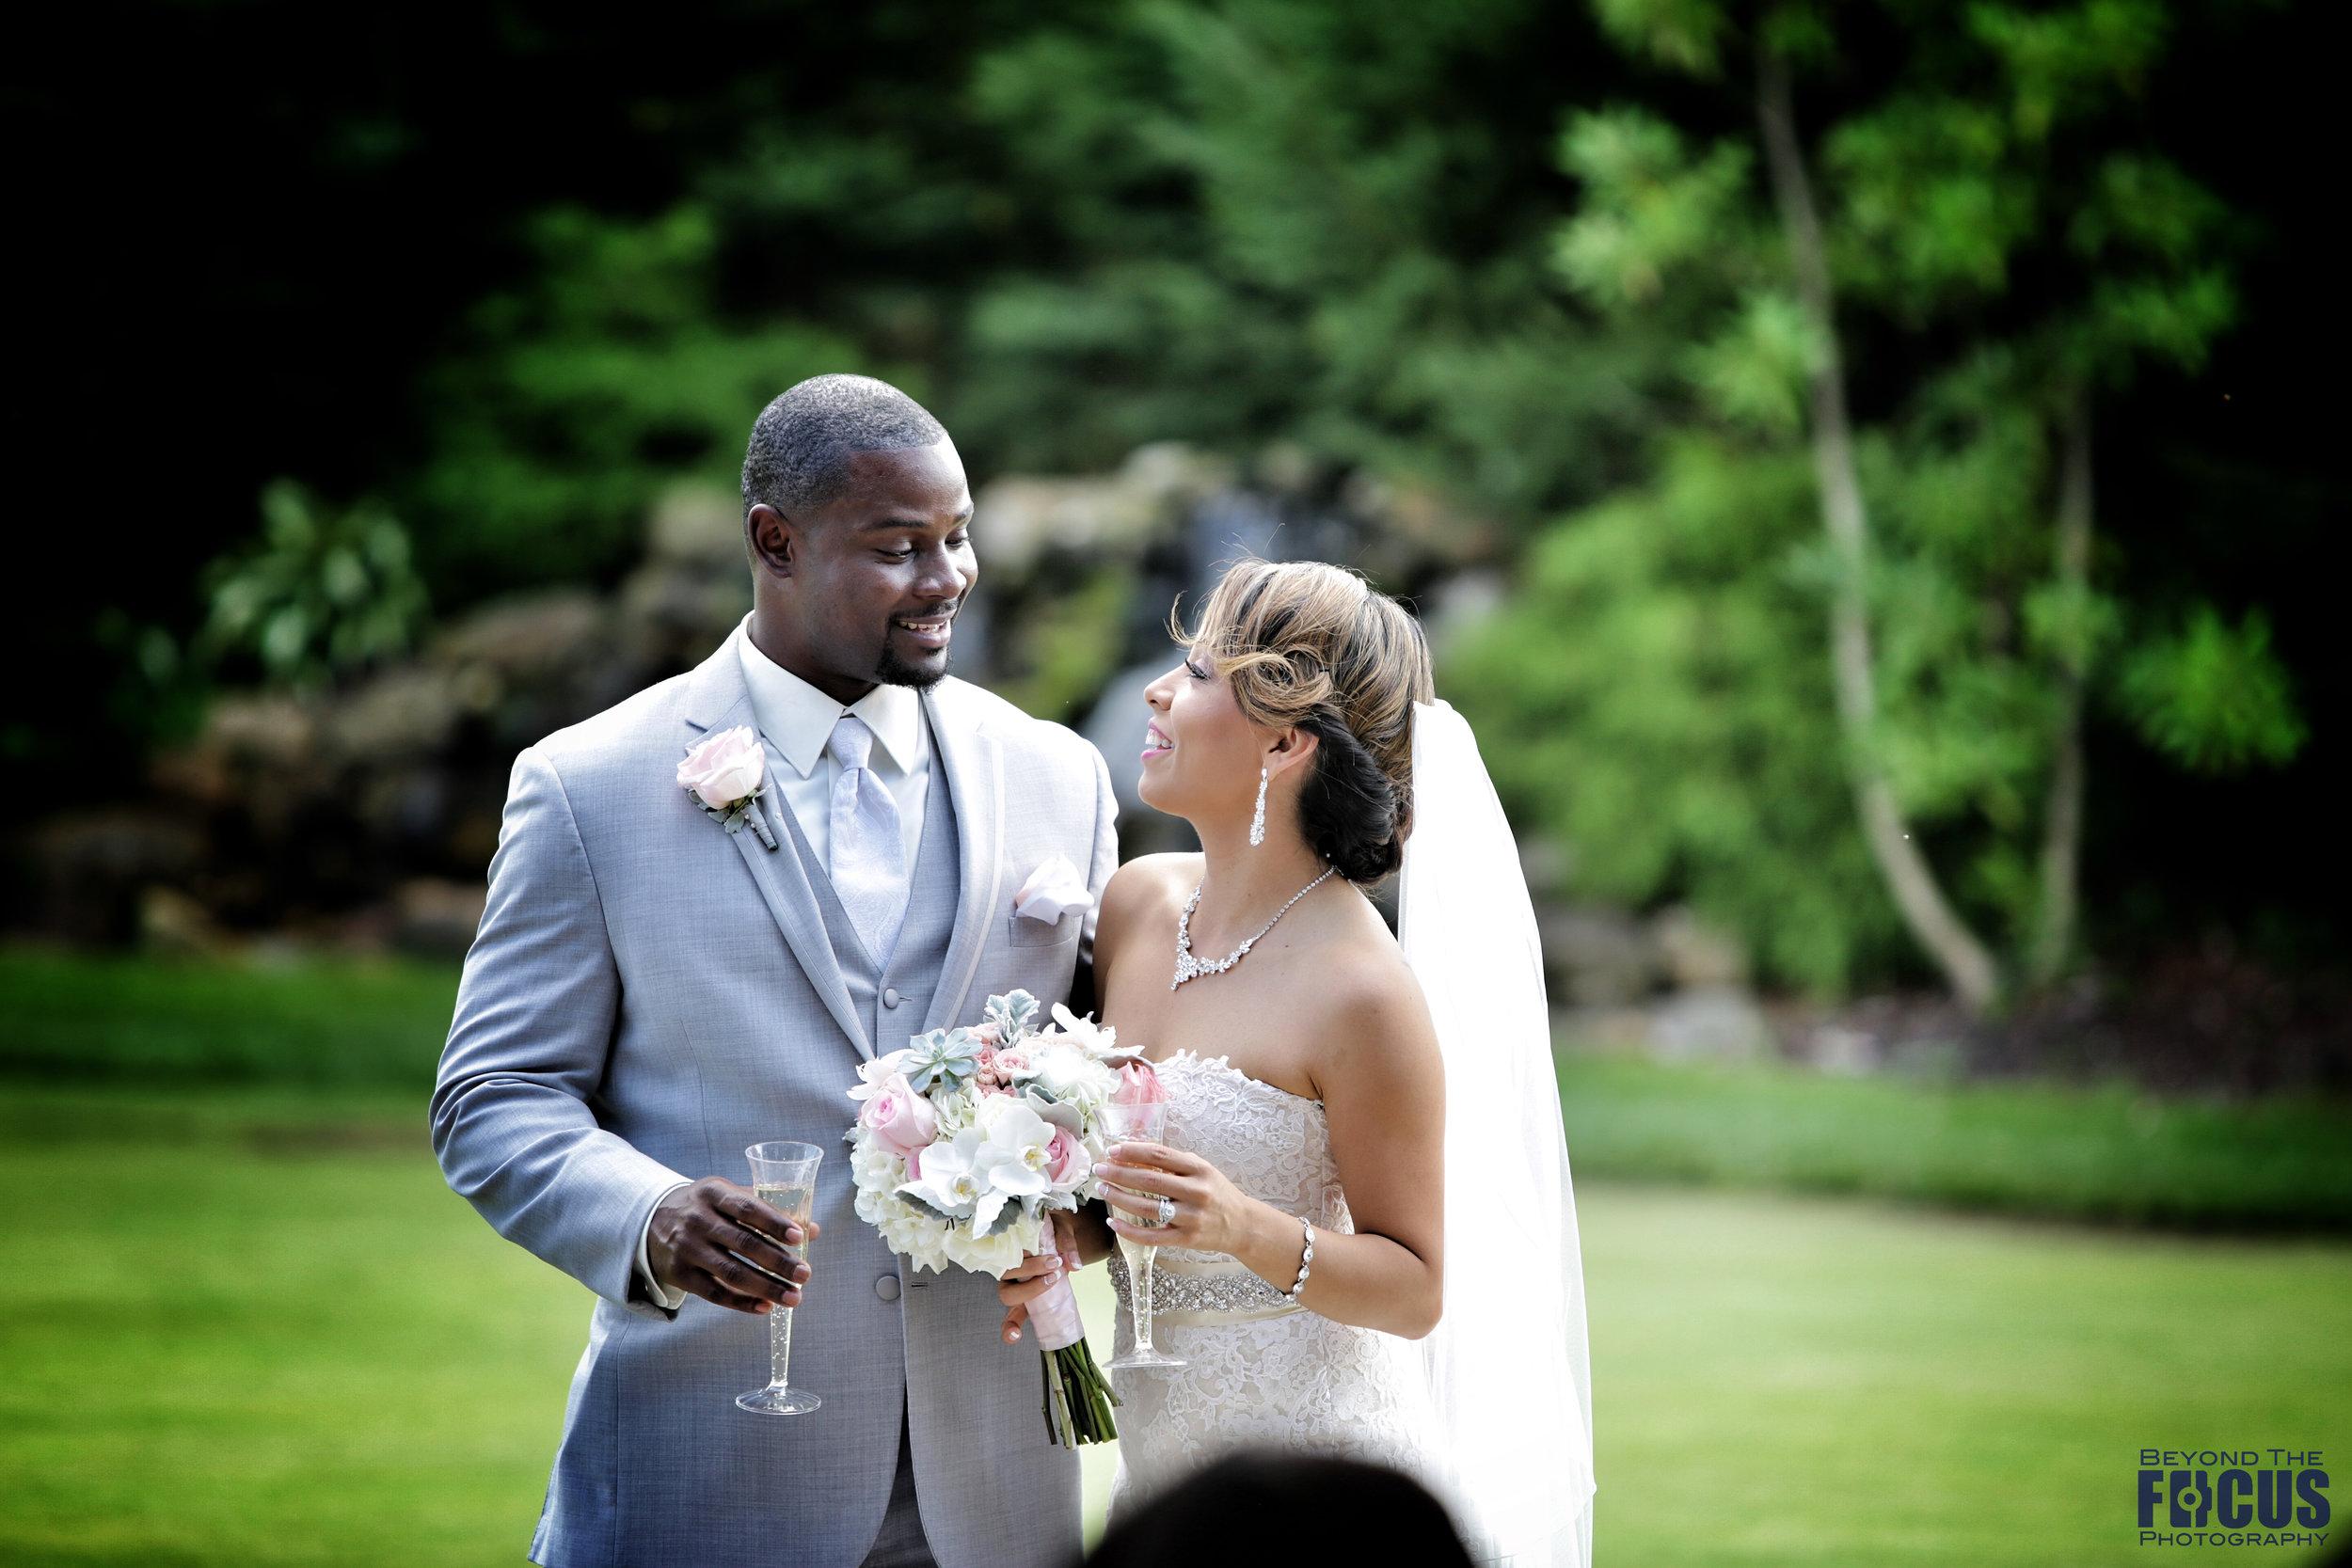 Palmer Wedding - Wedding Ceremony56.jpg